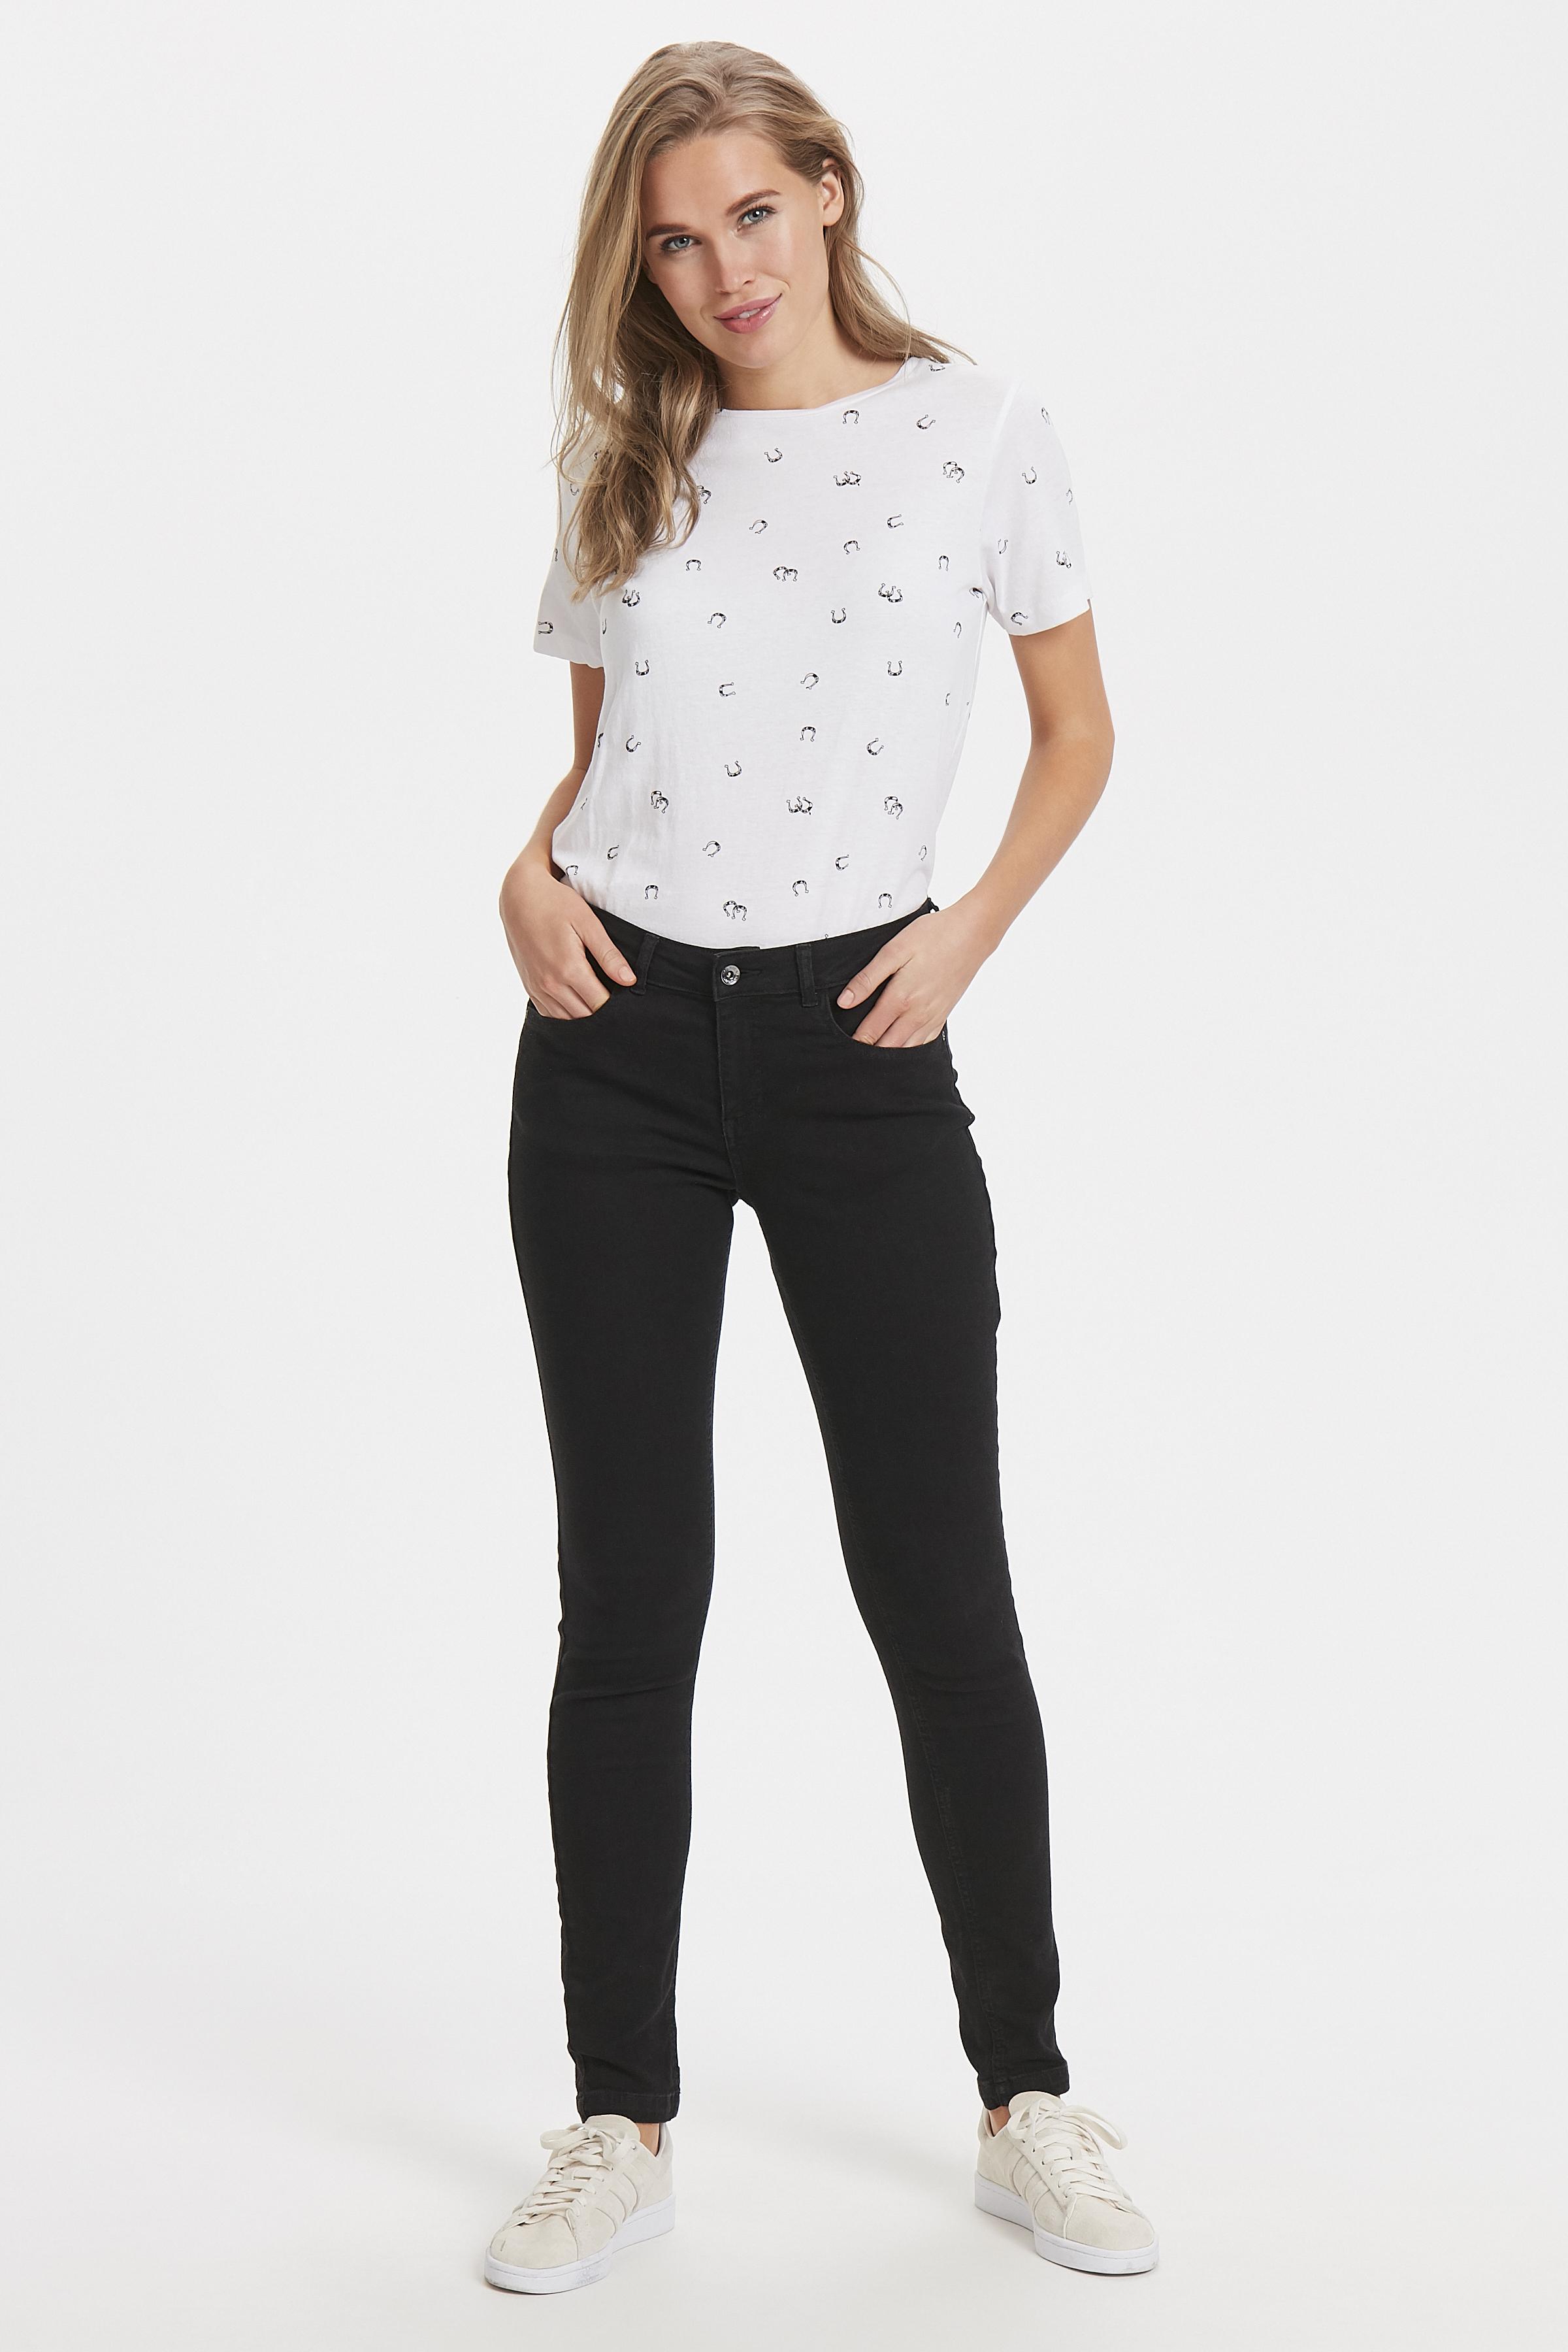 Black Jeans van b.young – Koop Black Jeans hier van size 25-36